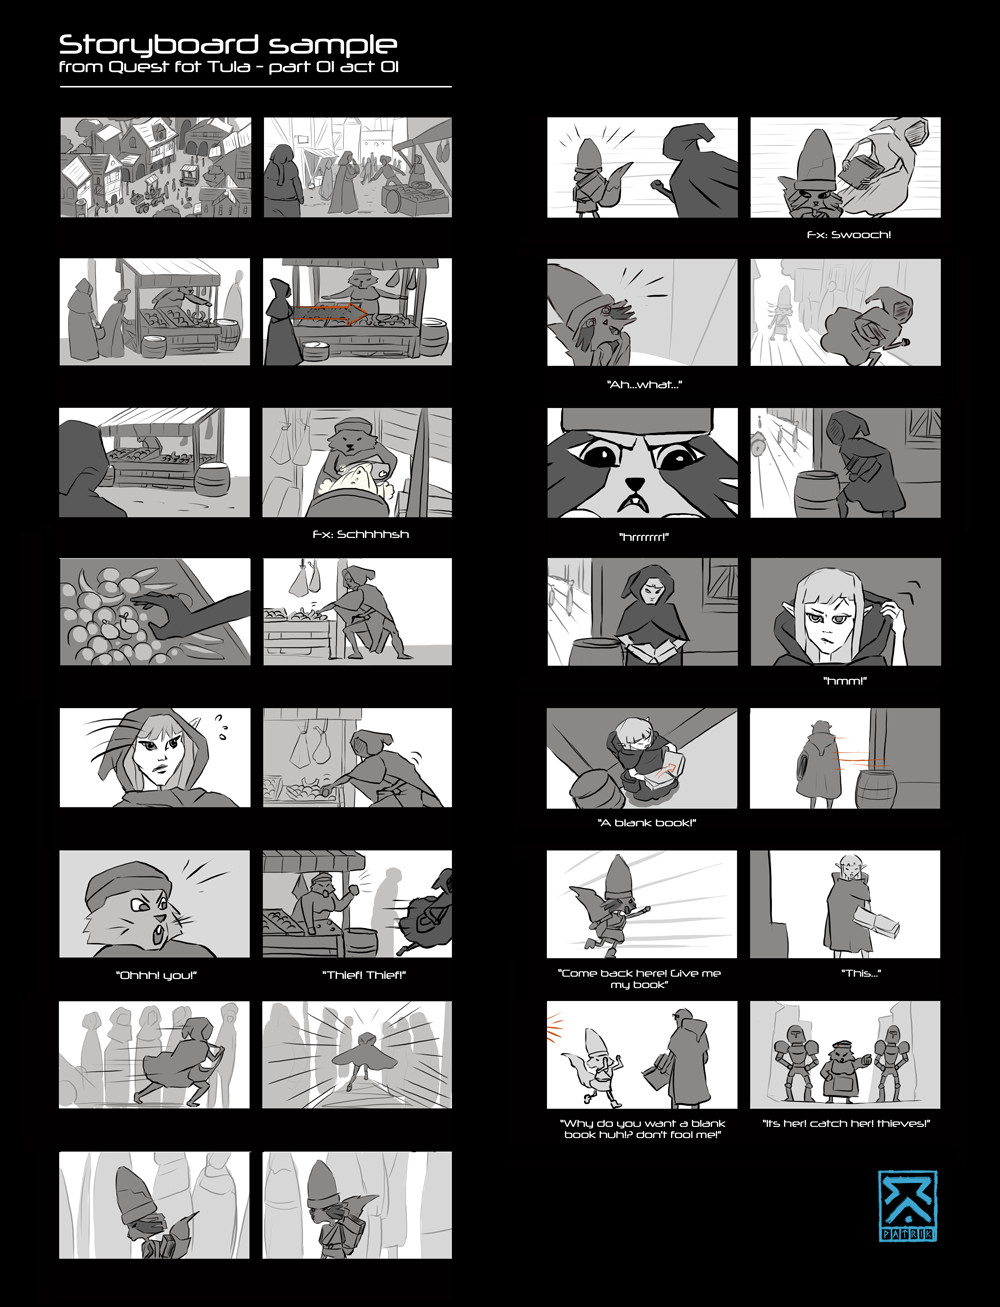 Patrik caetano storyboard01